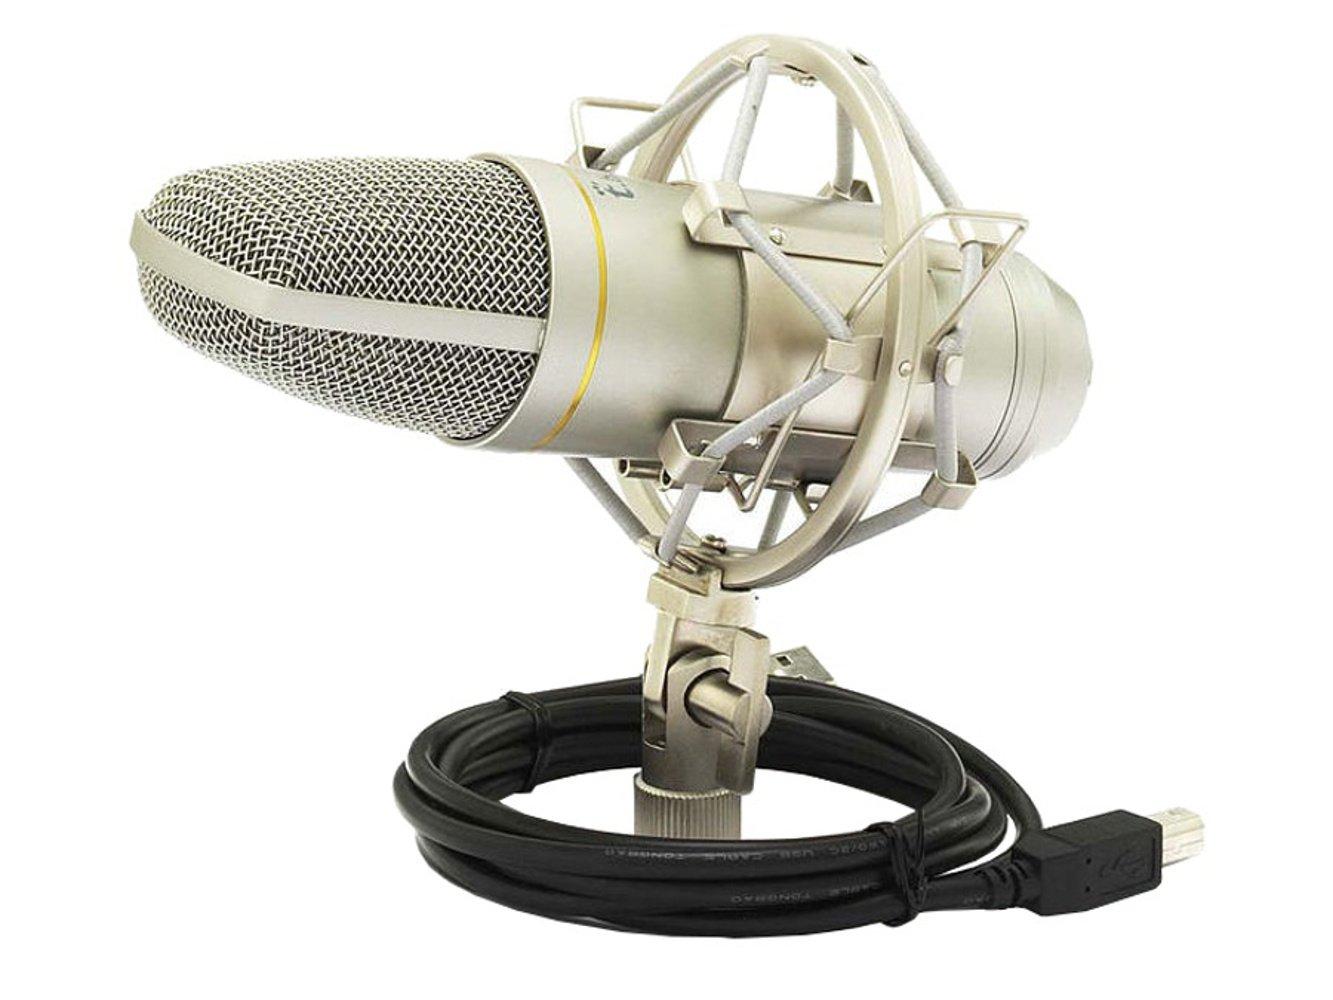 Thomann The T. Bone SC 440 USB Podcast Bundle micrófono con soporte y tapa: Amazon.es: Instrumentos musicales